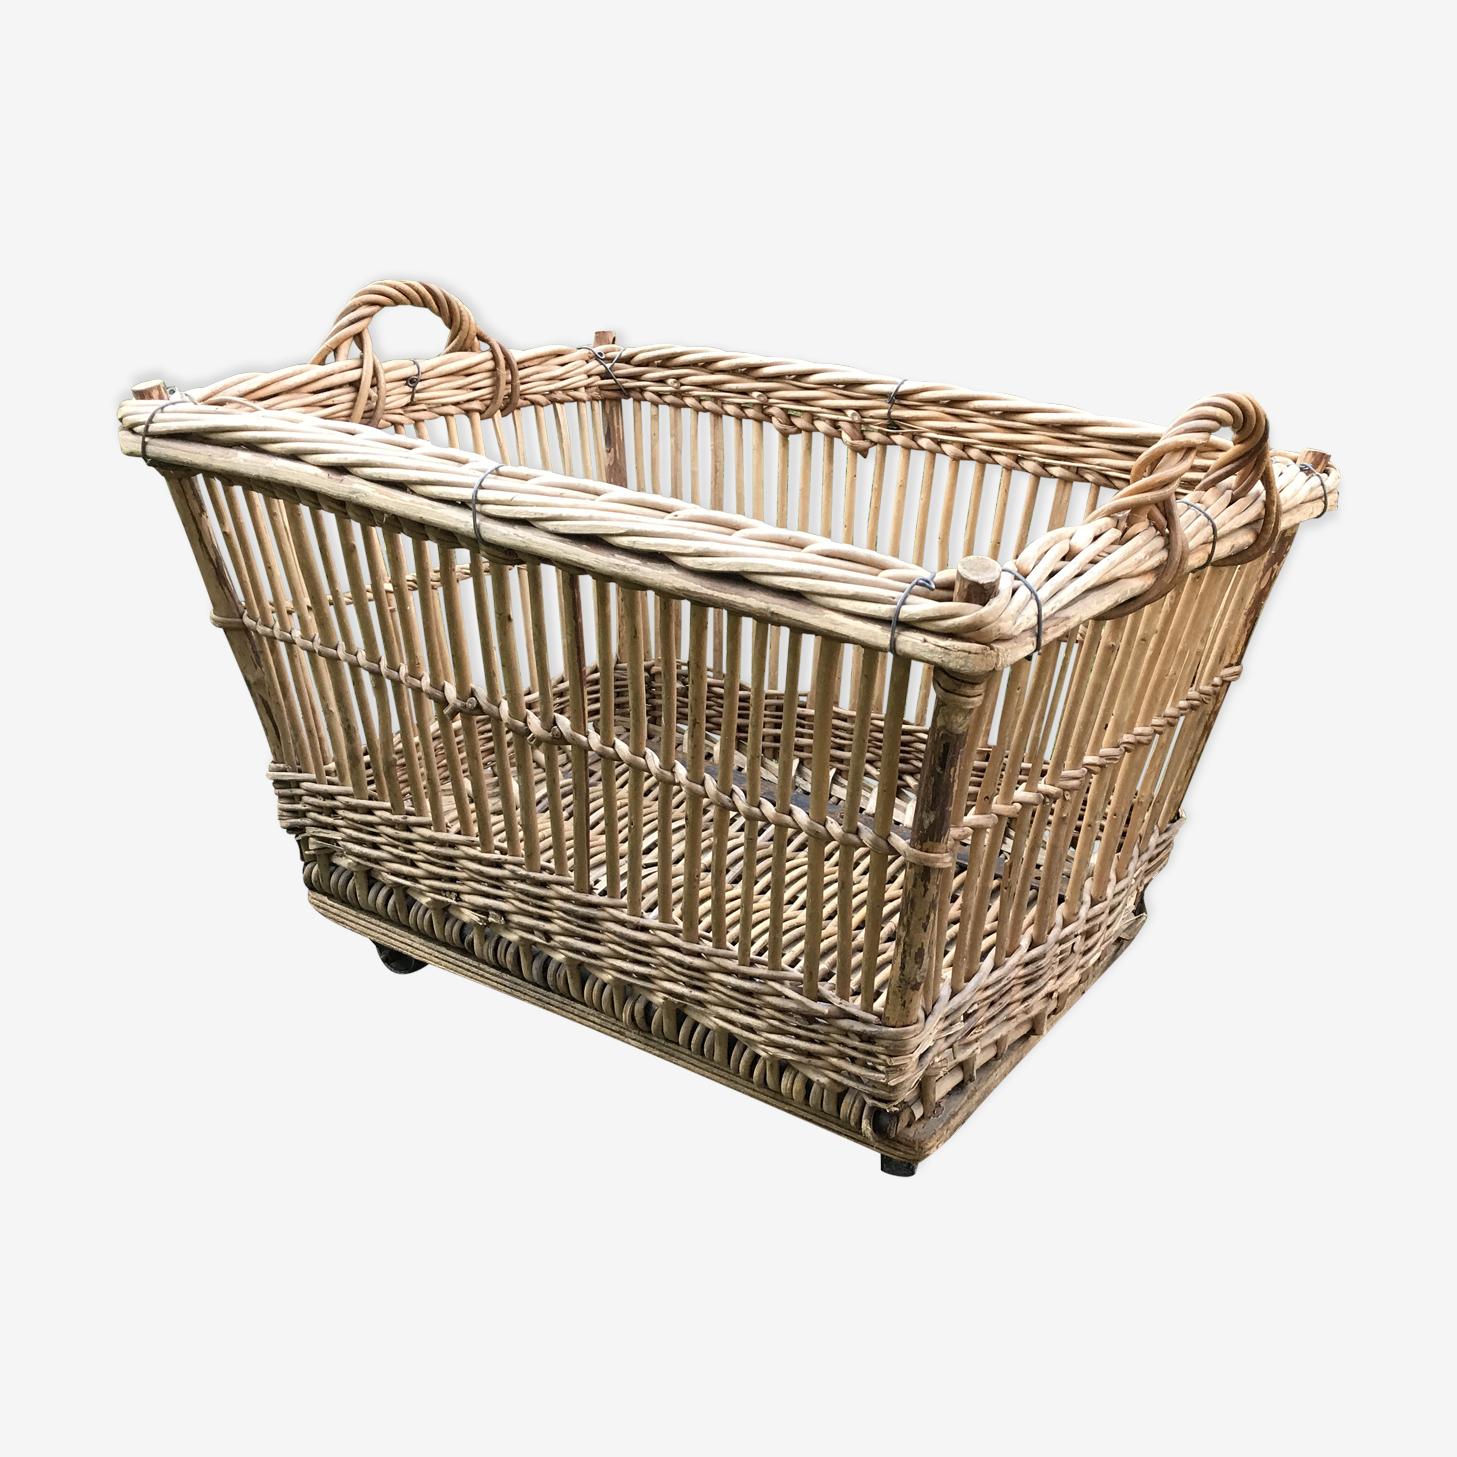 Basket on wheels vintage rattan